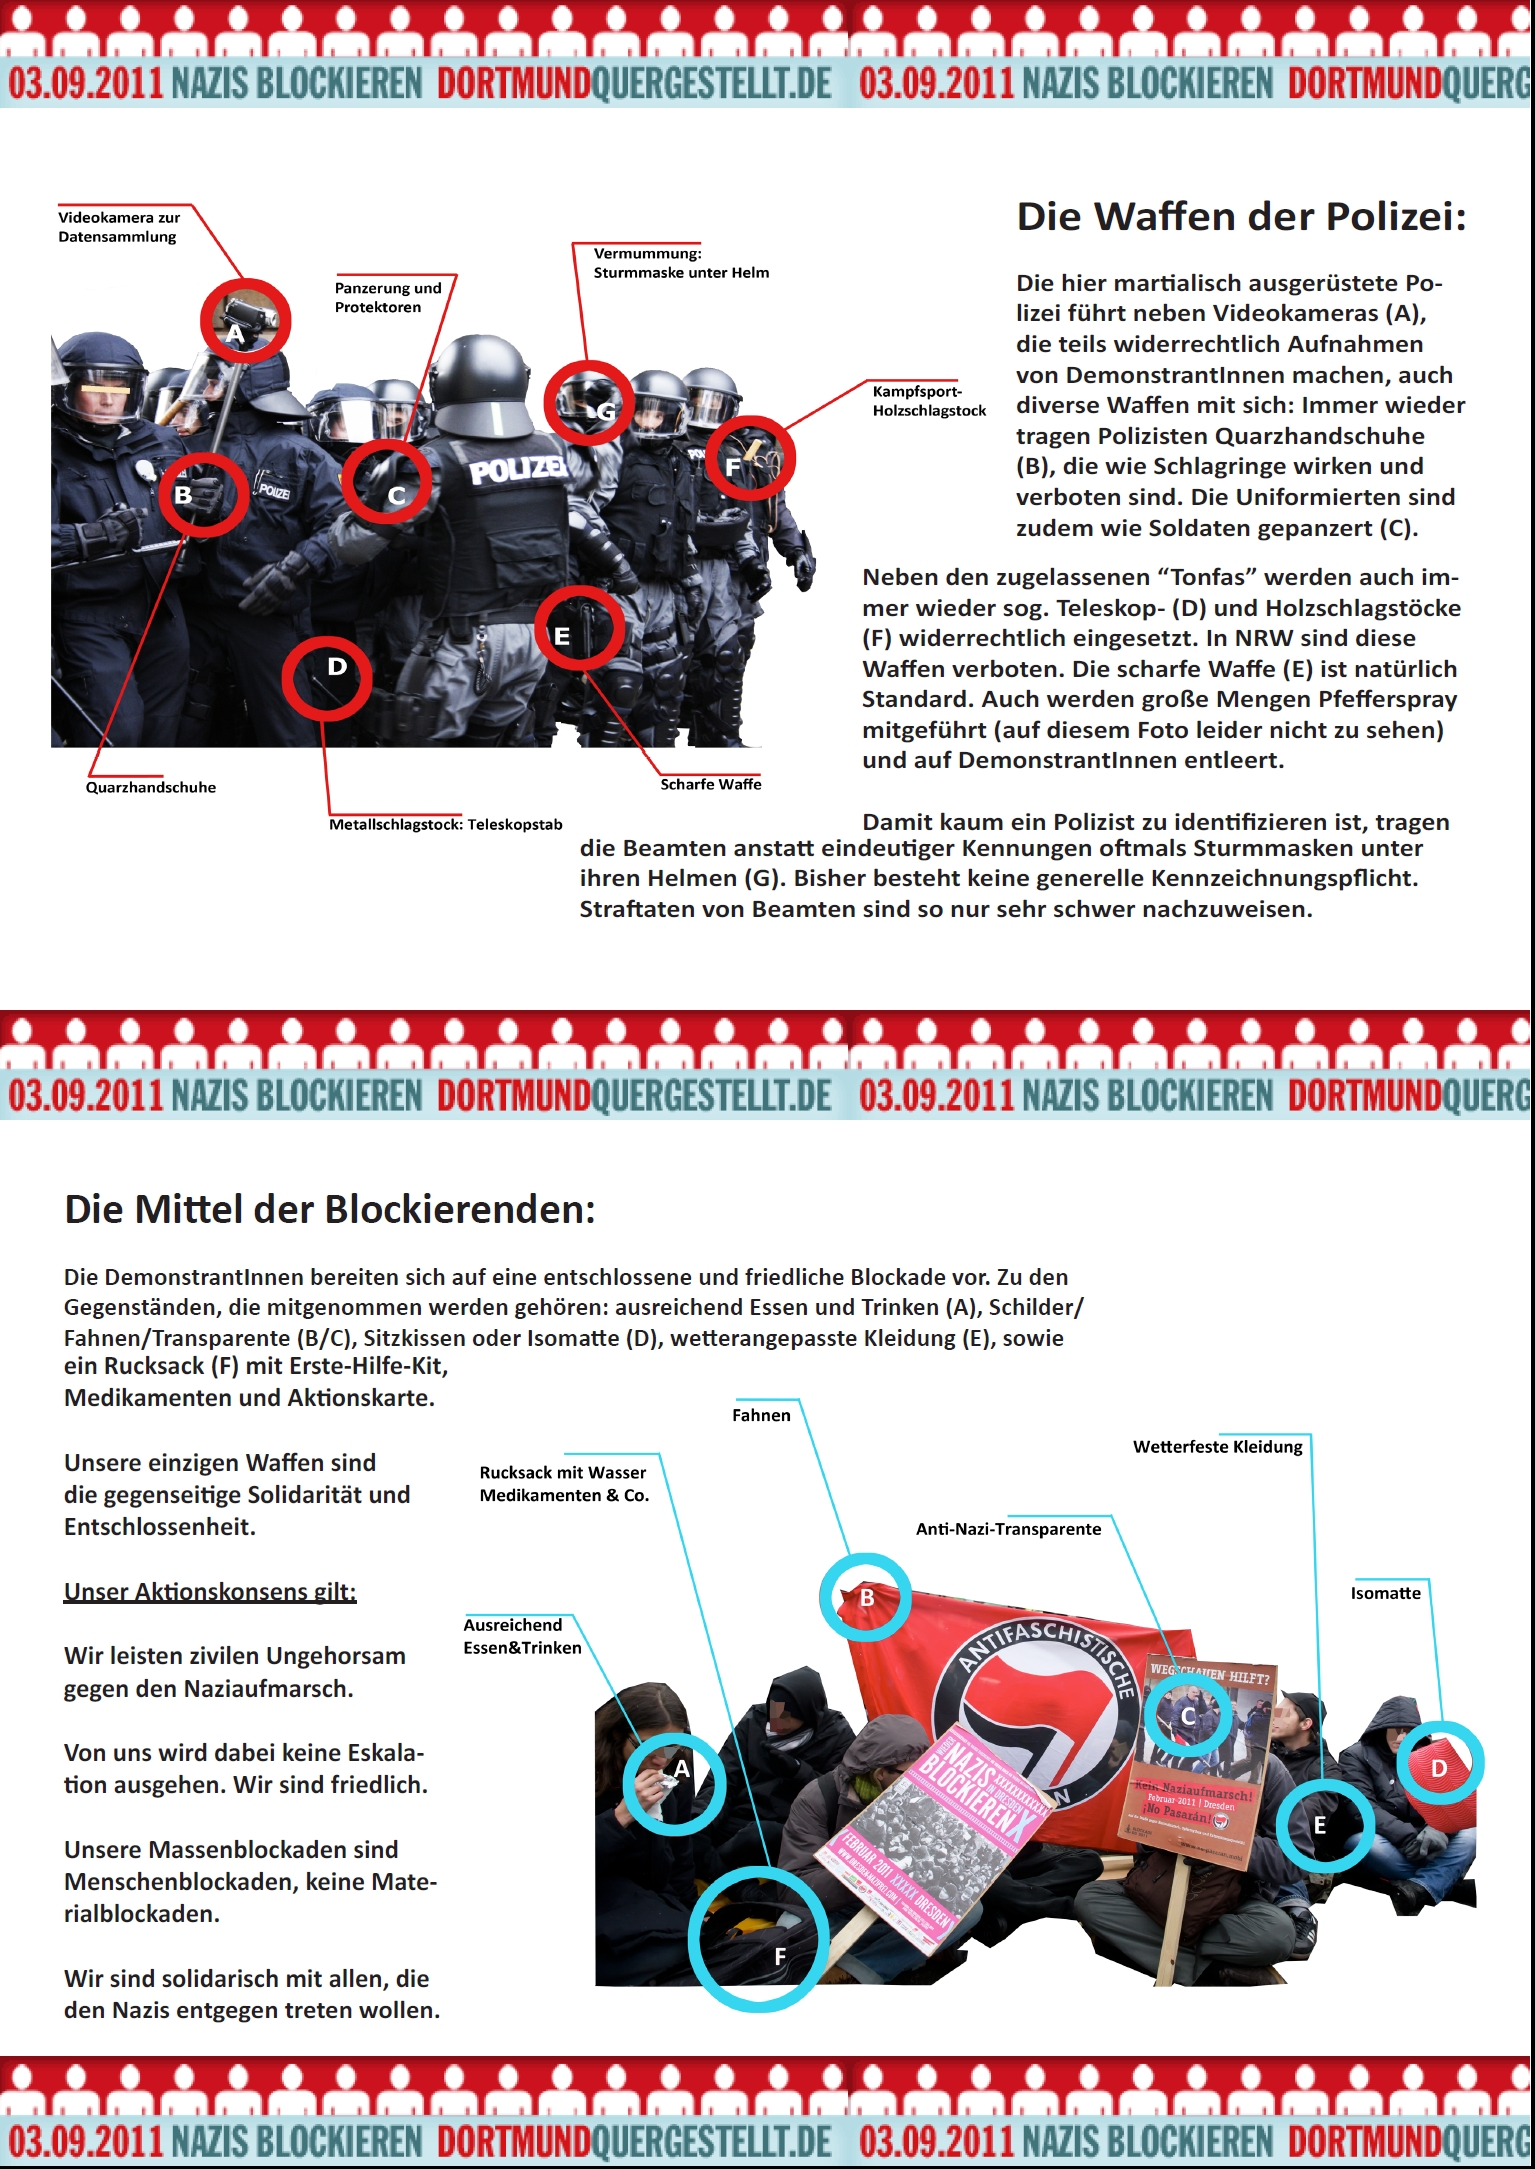 http://dortmundquer.blogsport.de/images/Polizei_Blockierer.jpg